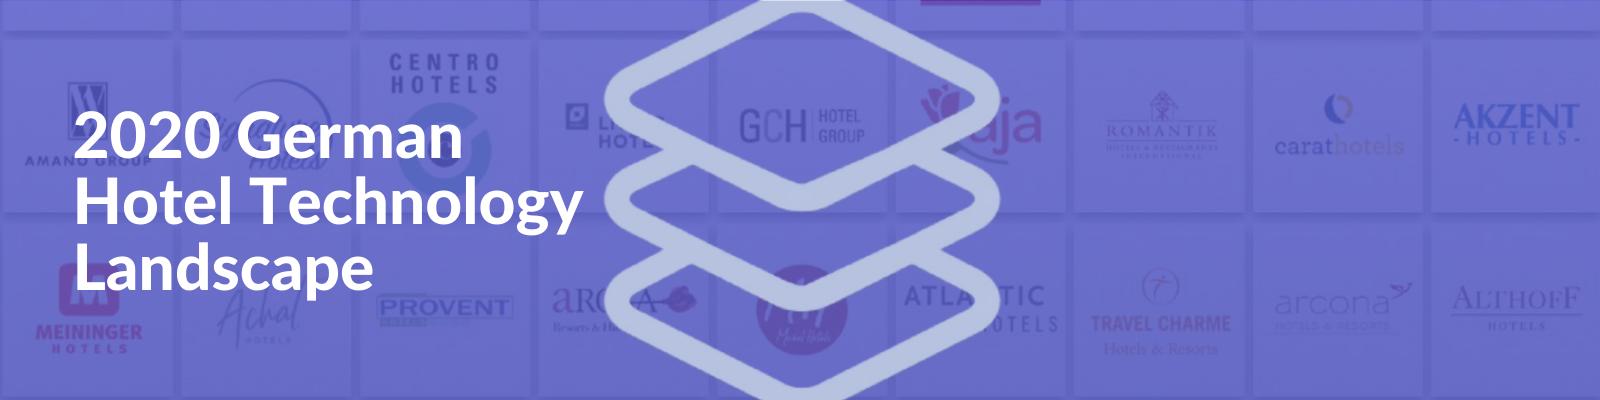 2020 German Hotel Technology Landscape